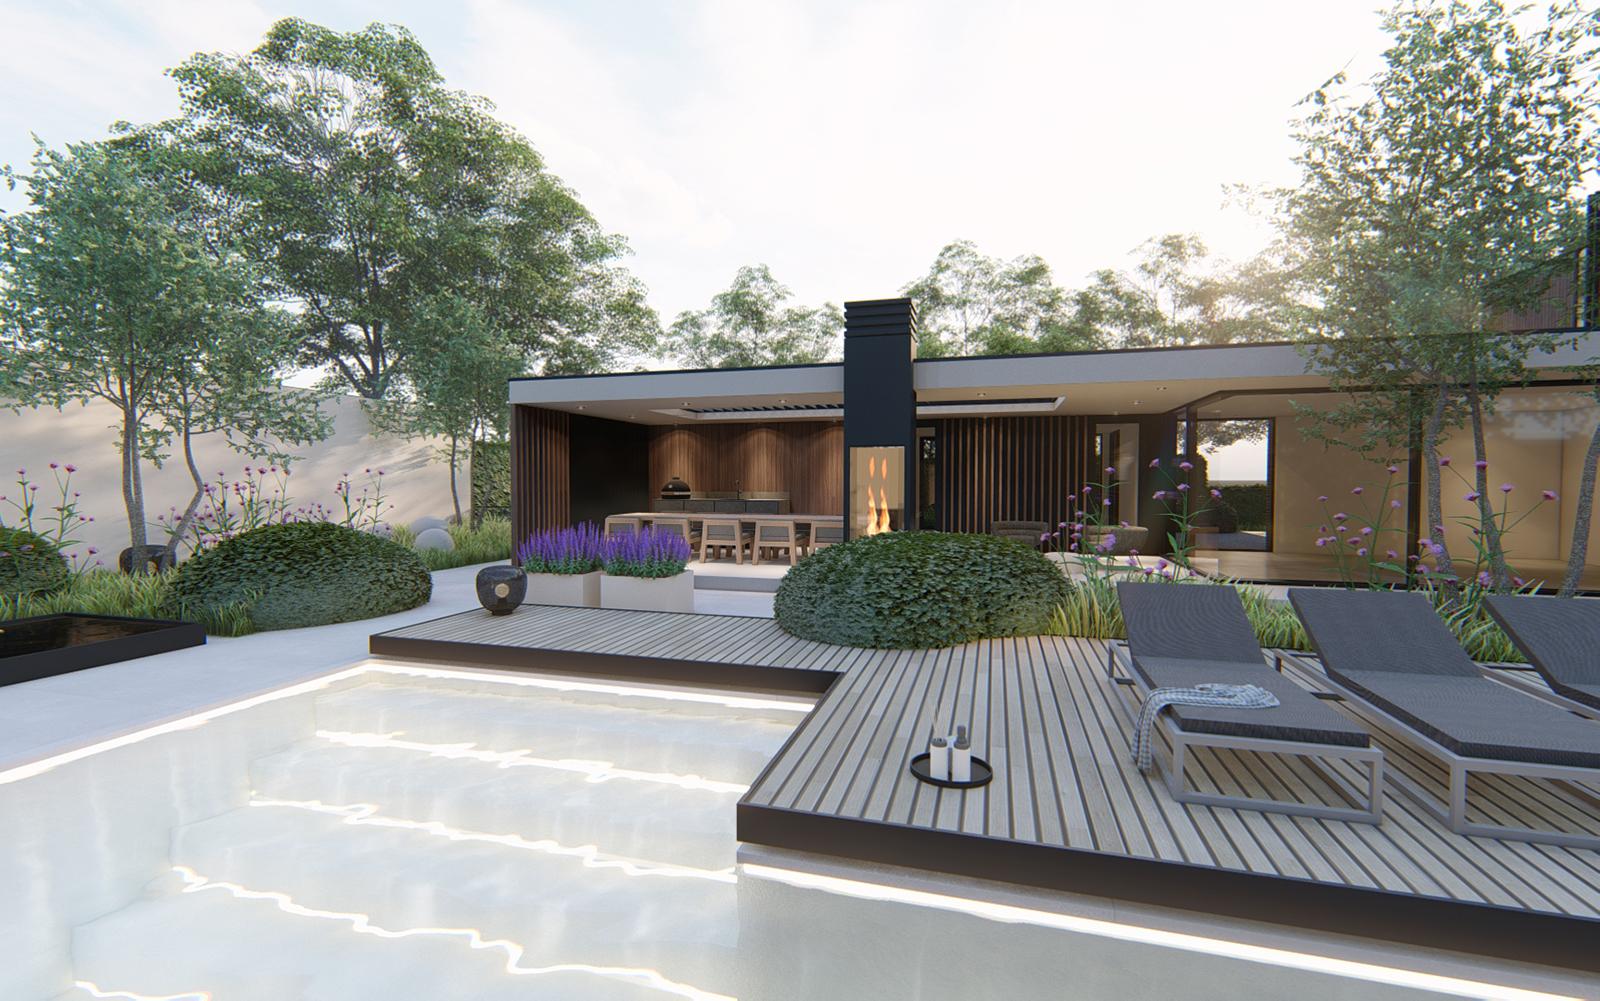 Moderne tuin, Knops Tuindesign, High-end luxe villa, natuurlijke uitstraling